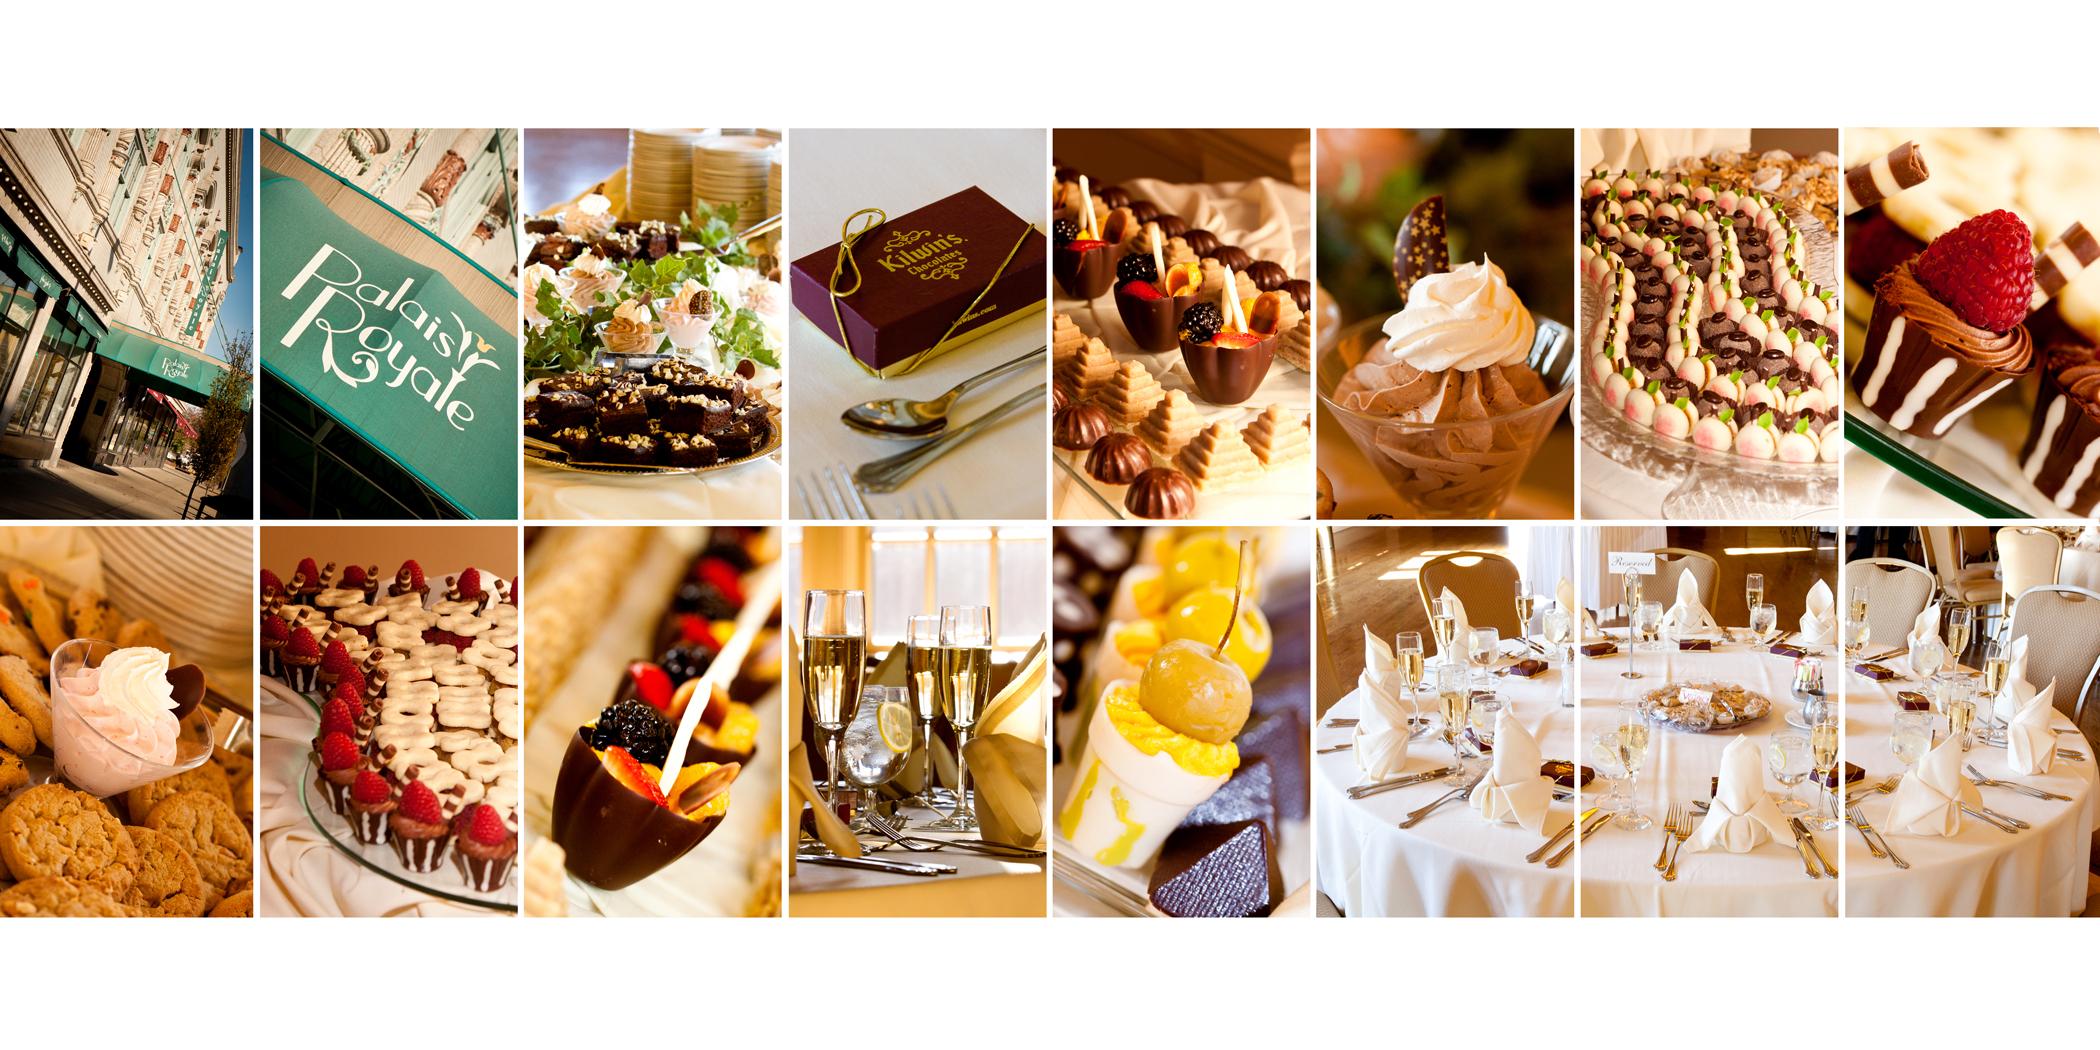 Wedding-Photography-Palaise-Royale-South-Bend-Indiana_23.jpg